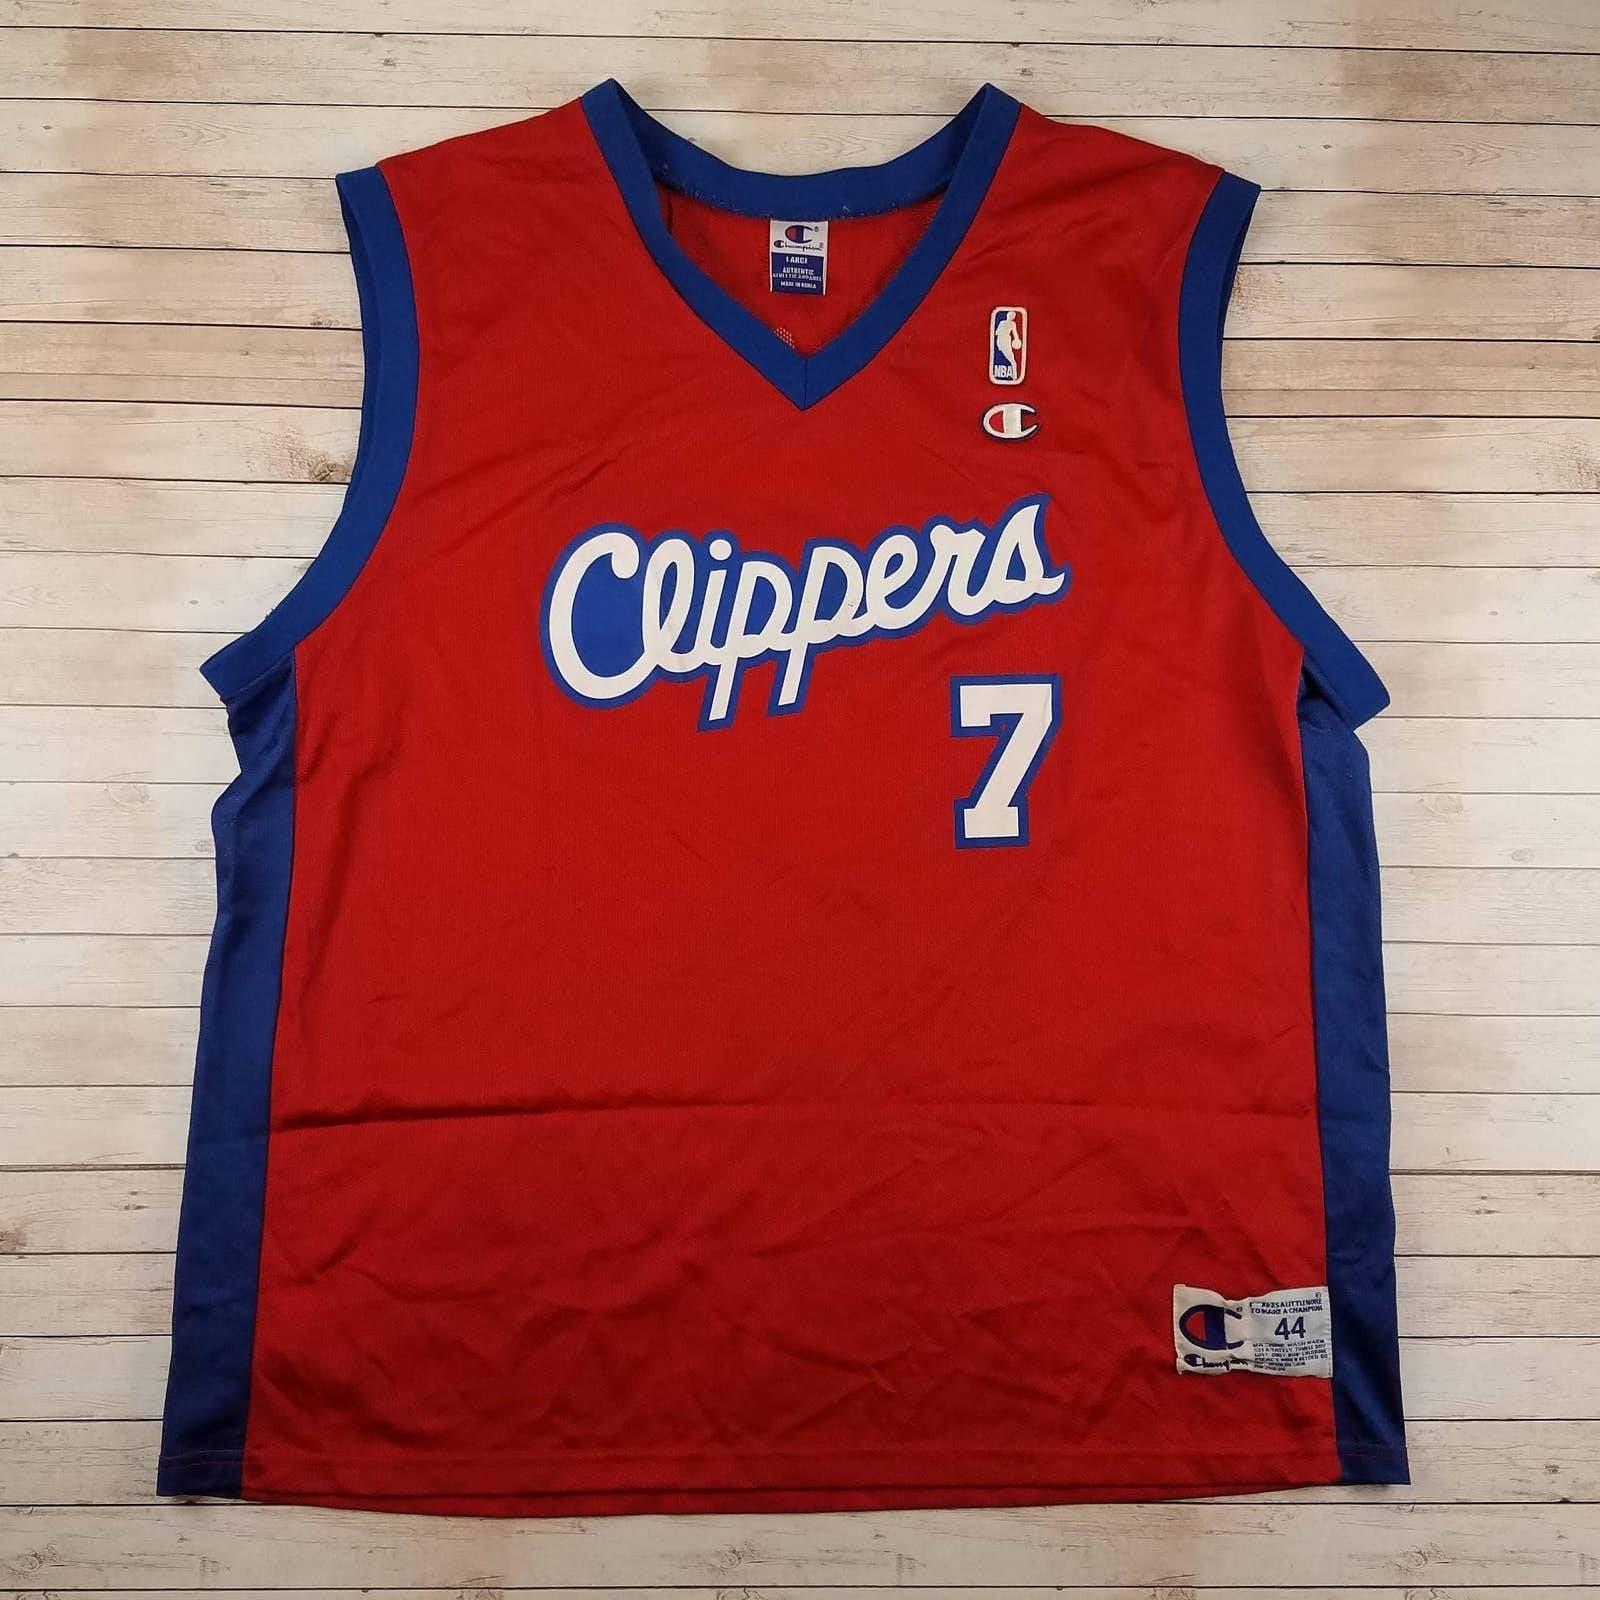 VTG 90s Odom LA Clippers Champion Jersey